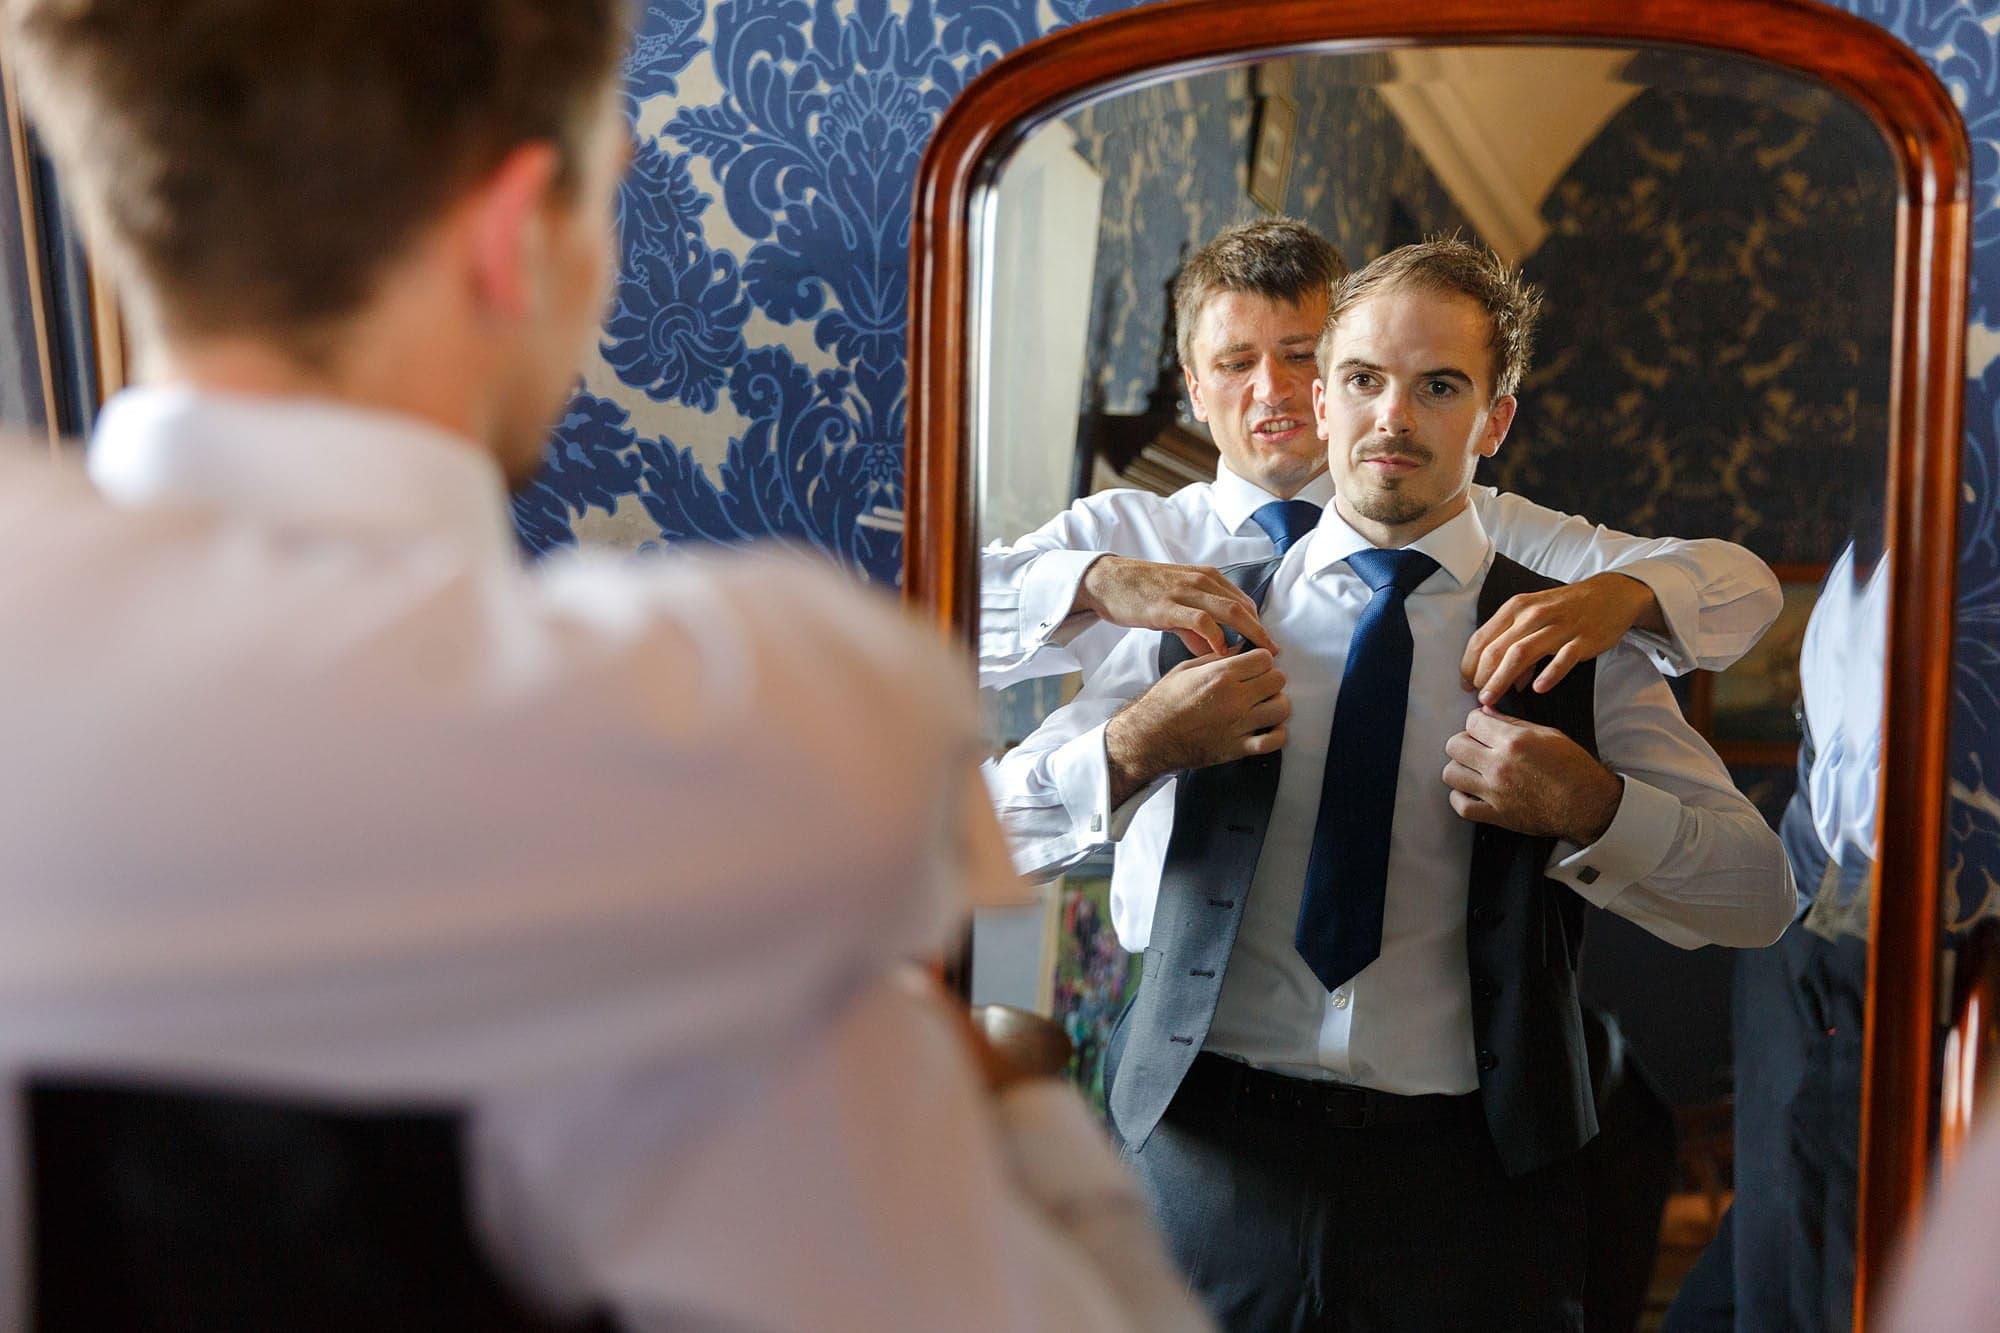 Hengrave Hall groom